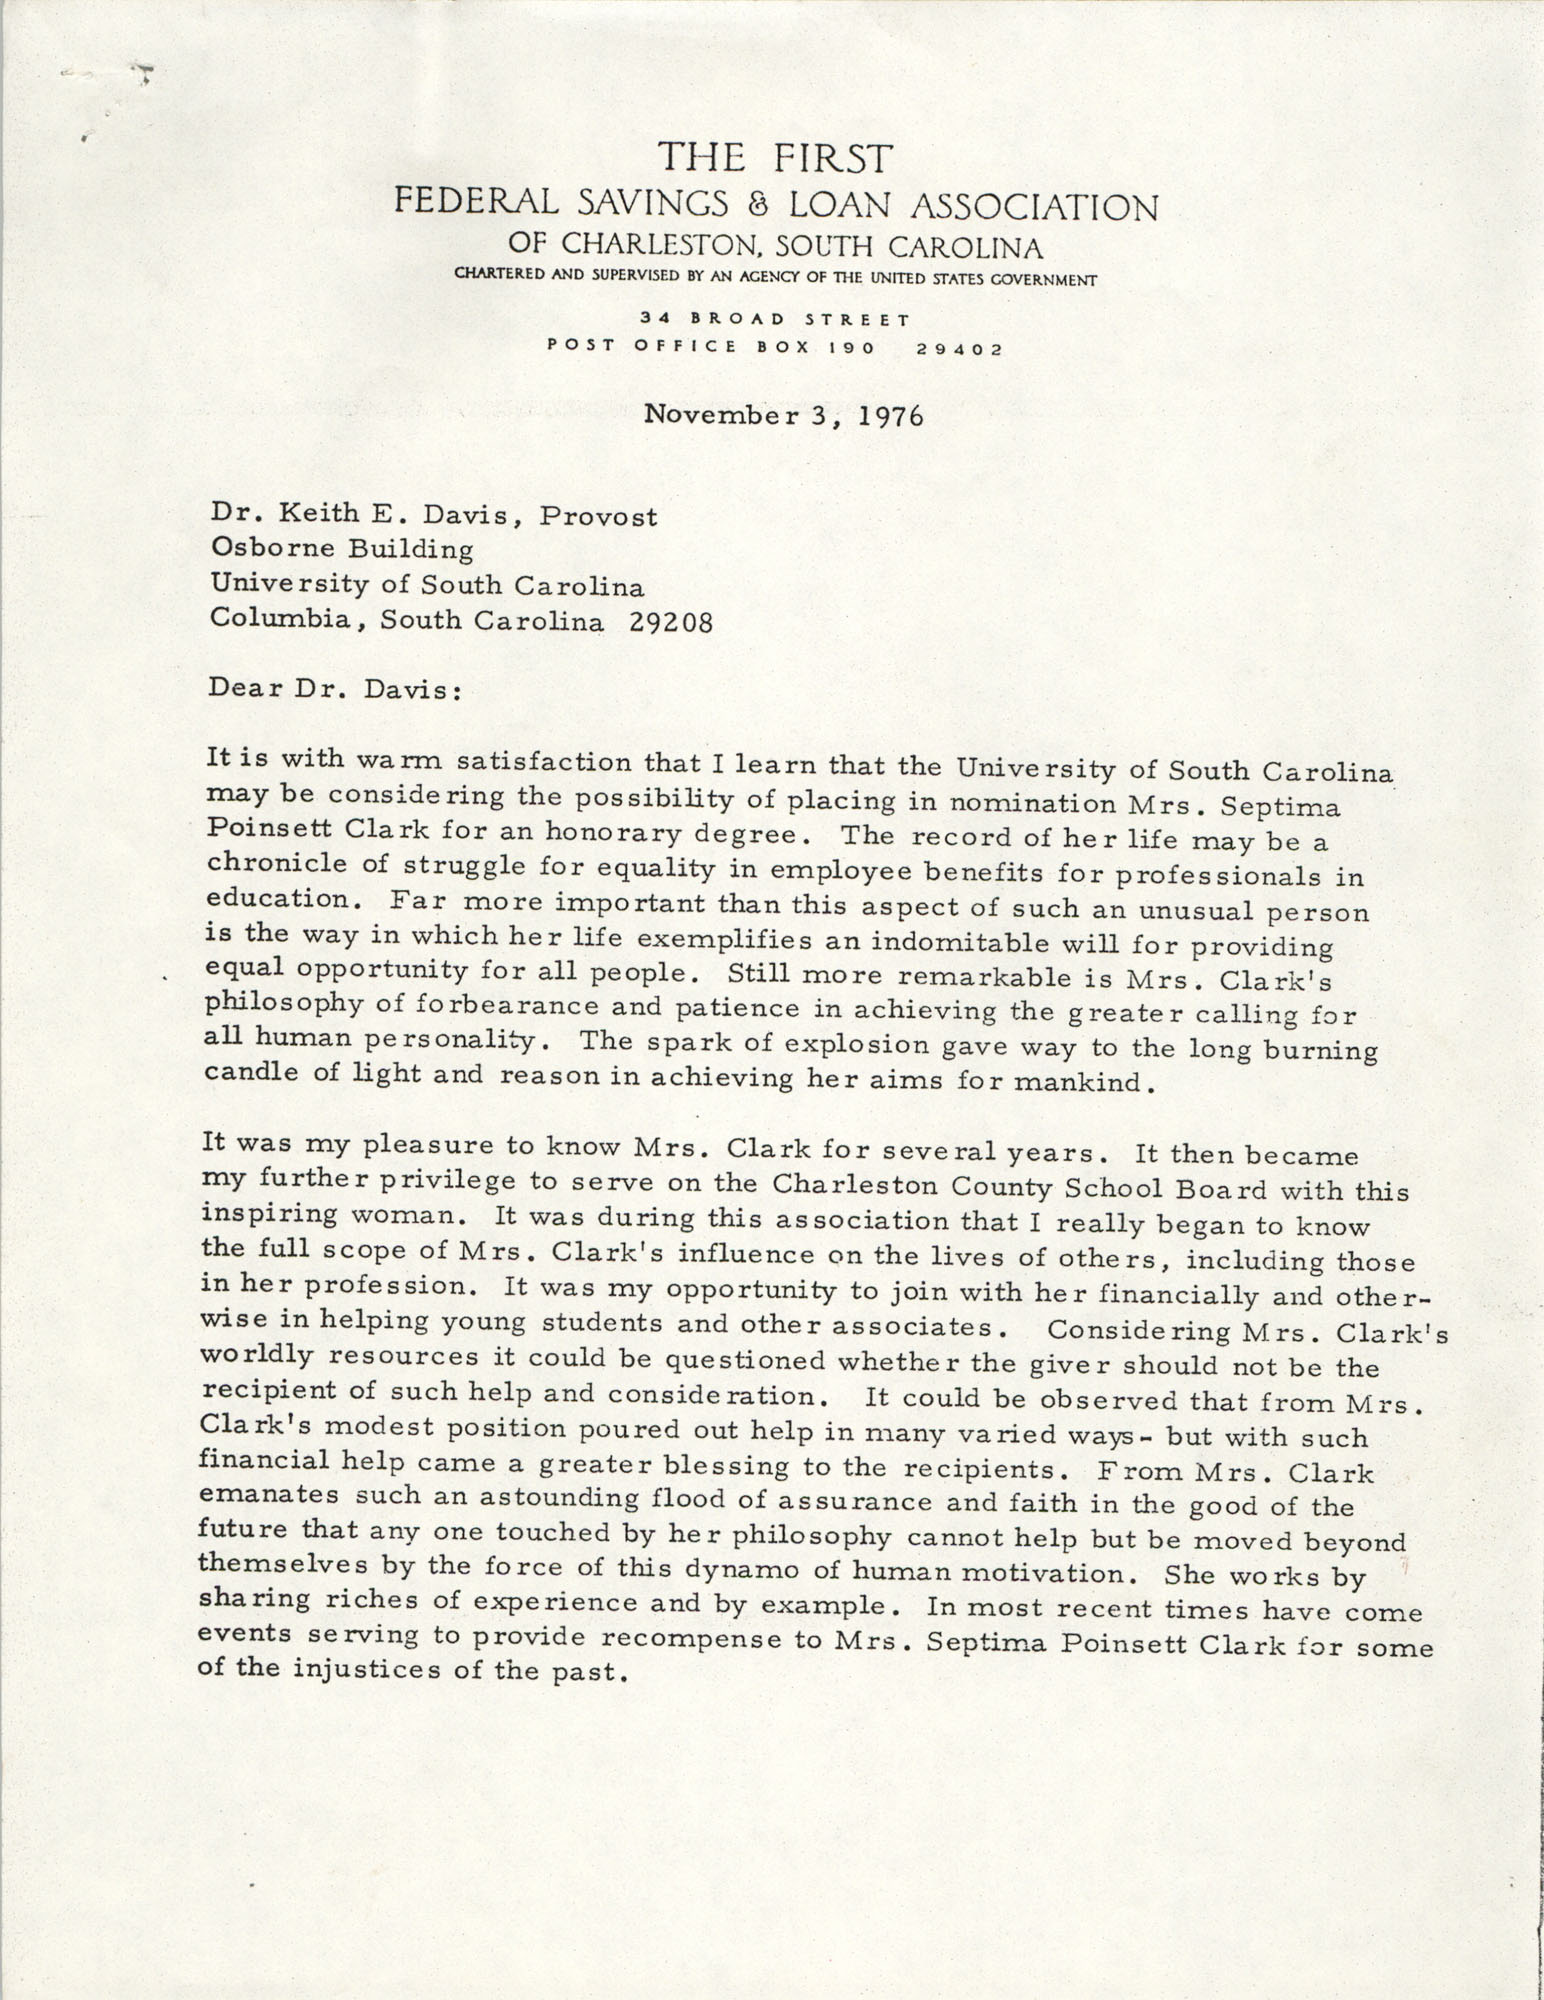 Letter from Howard F. Burky to Keith E. Davis, November 3, 1976